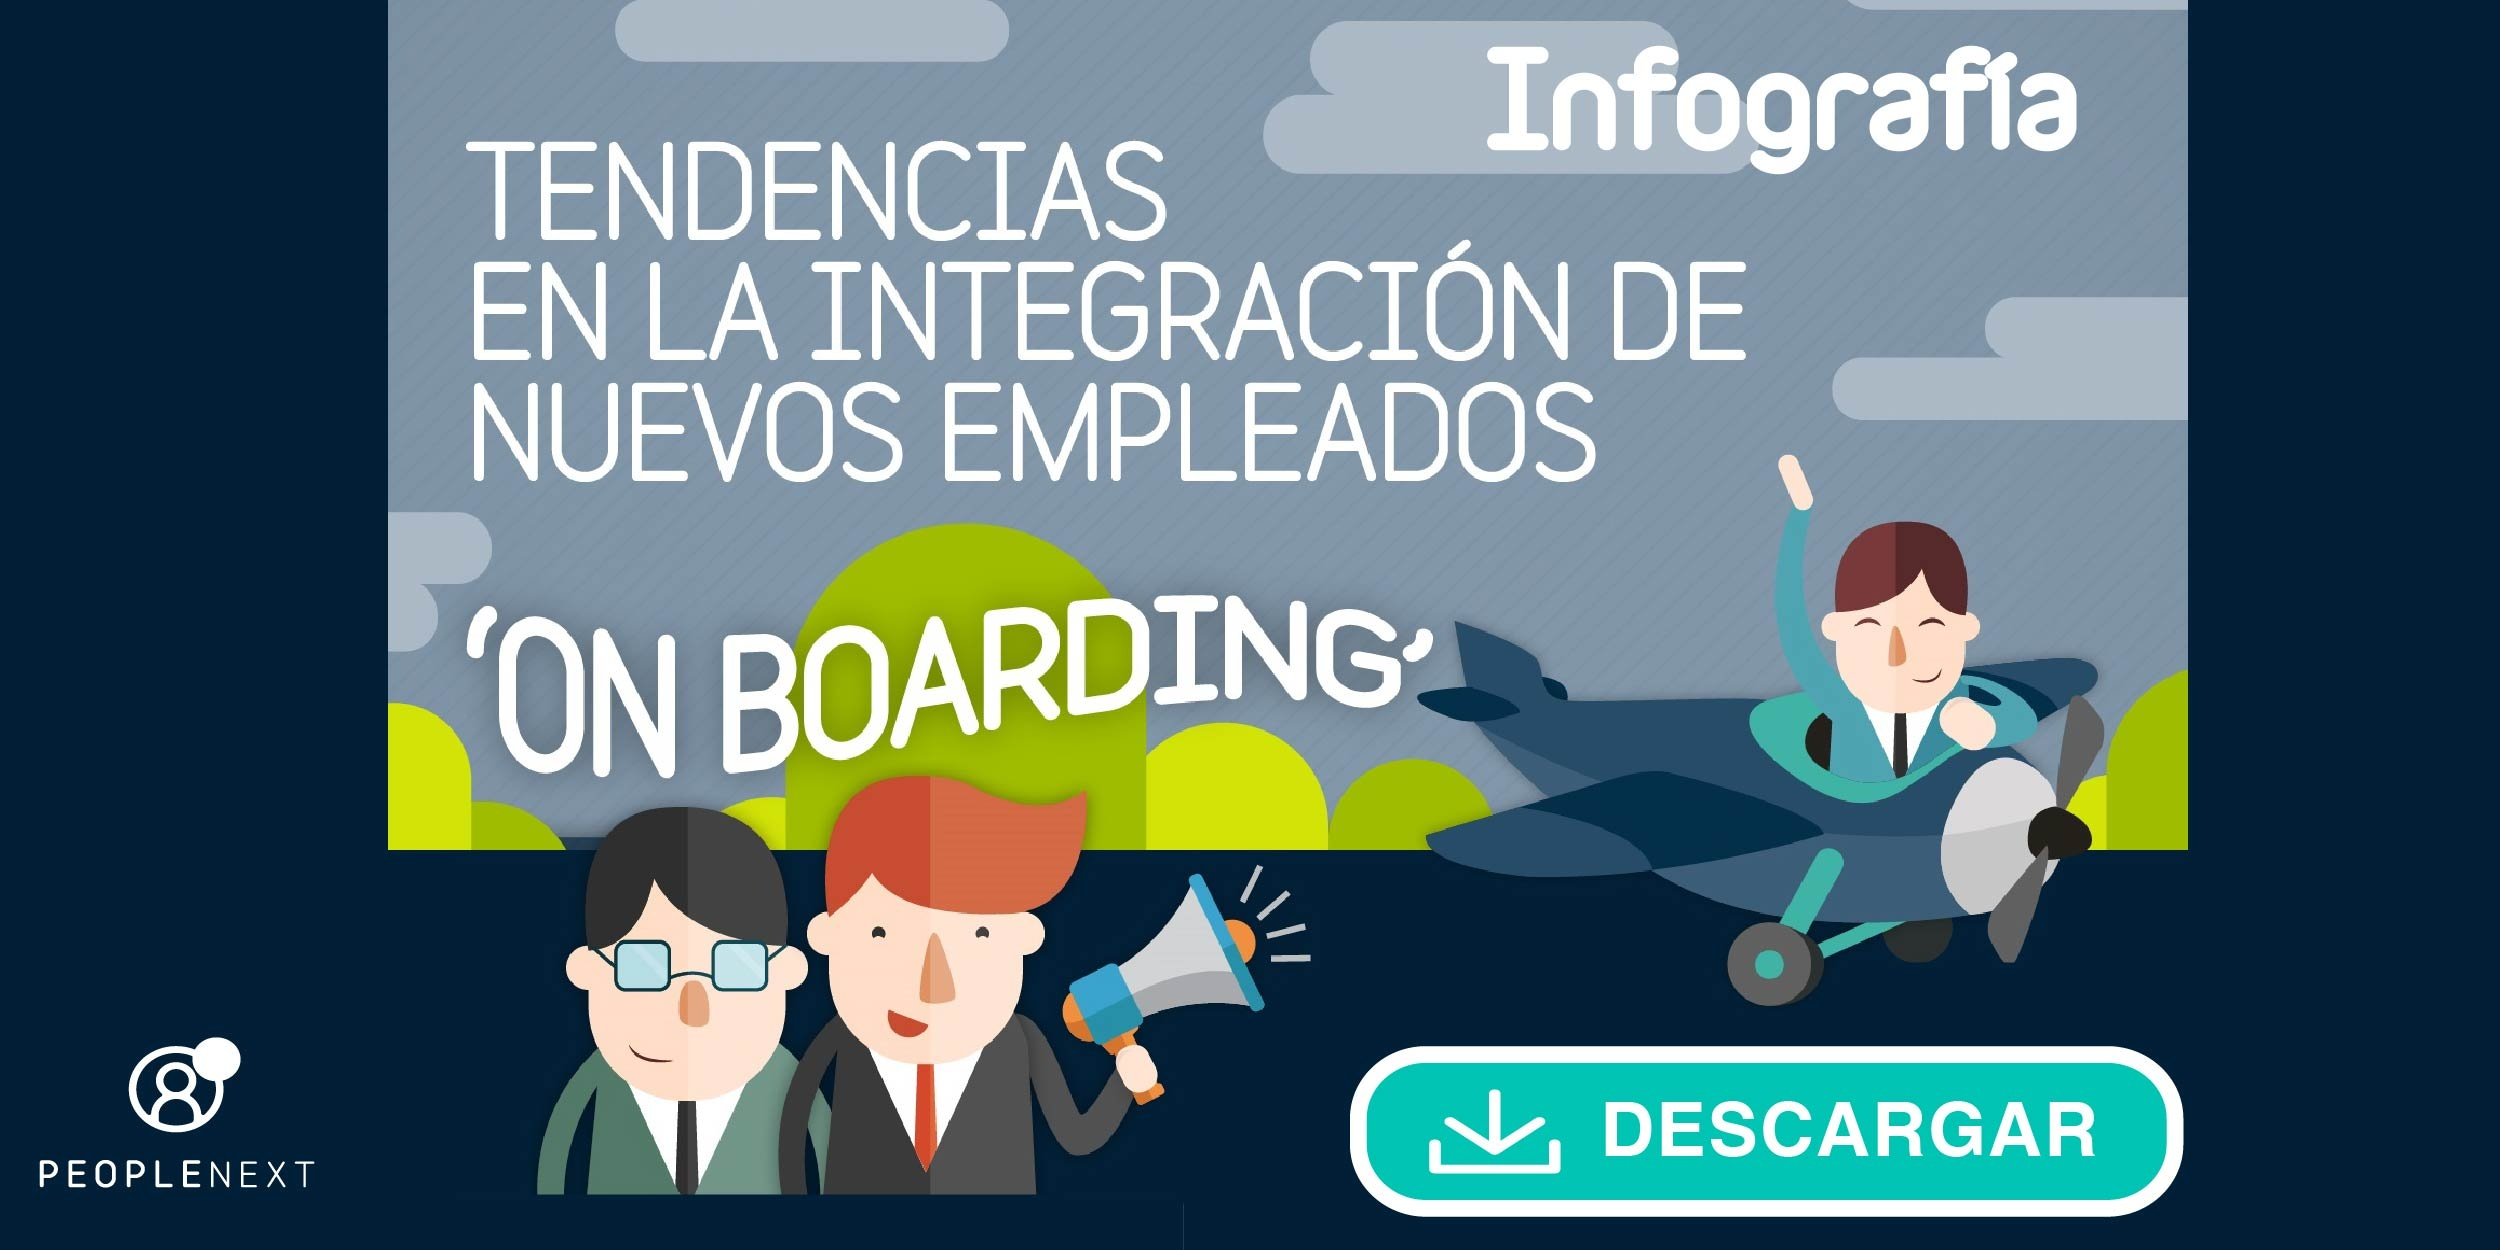 Infografia_Tendencias_Onboarding